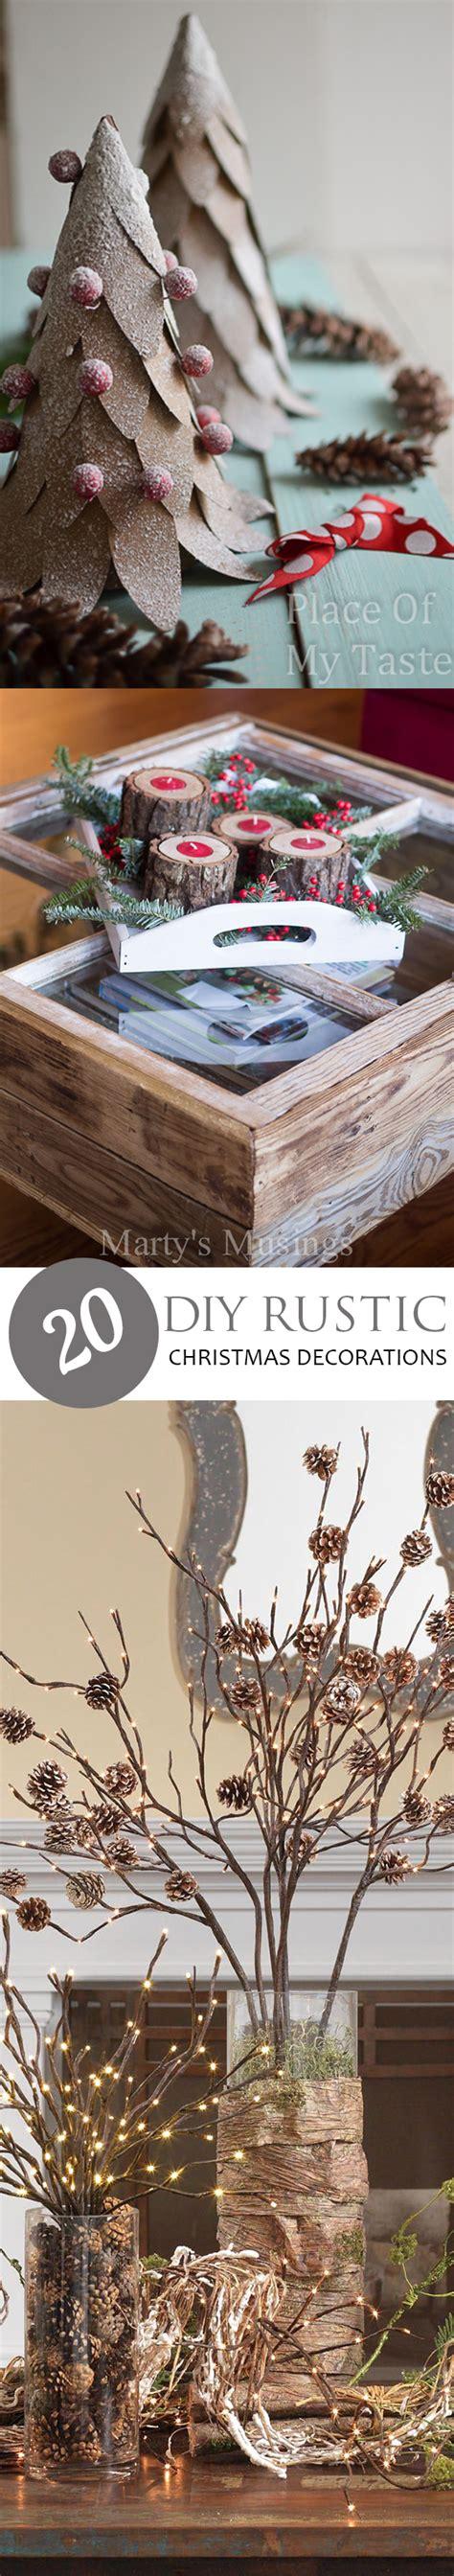 homemade home decor 20 diy rustic christmas decorations pickled barrel